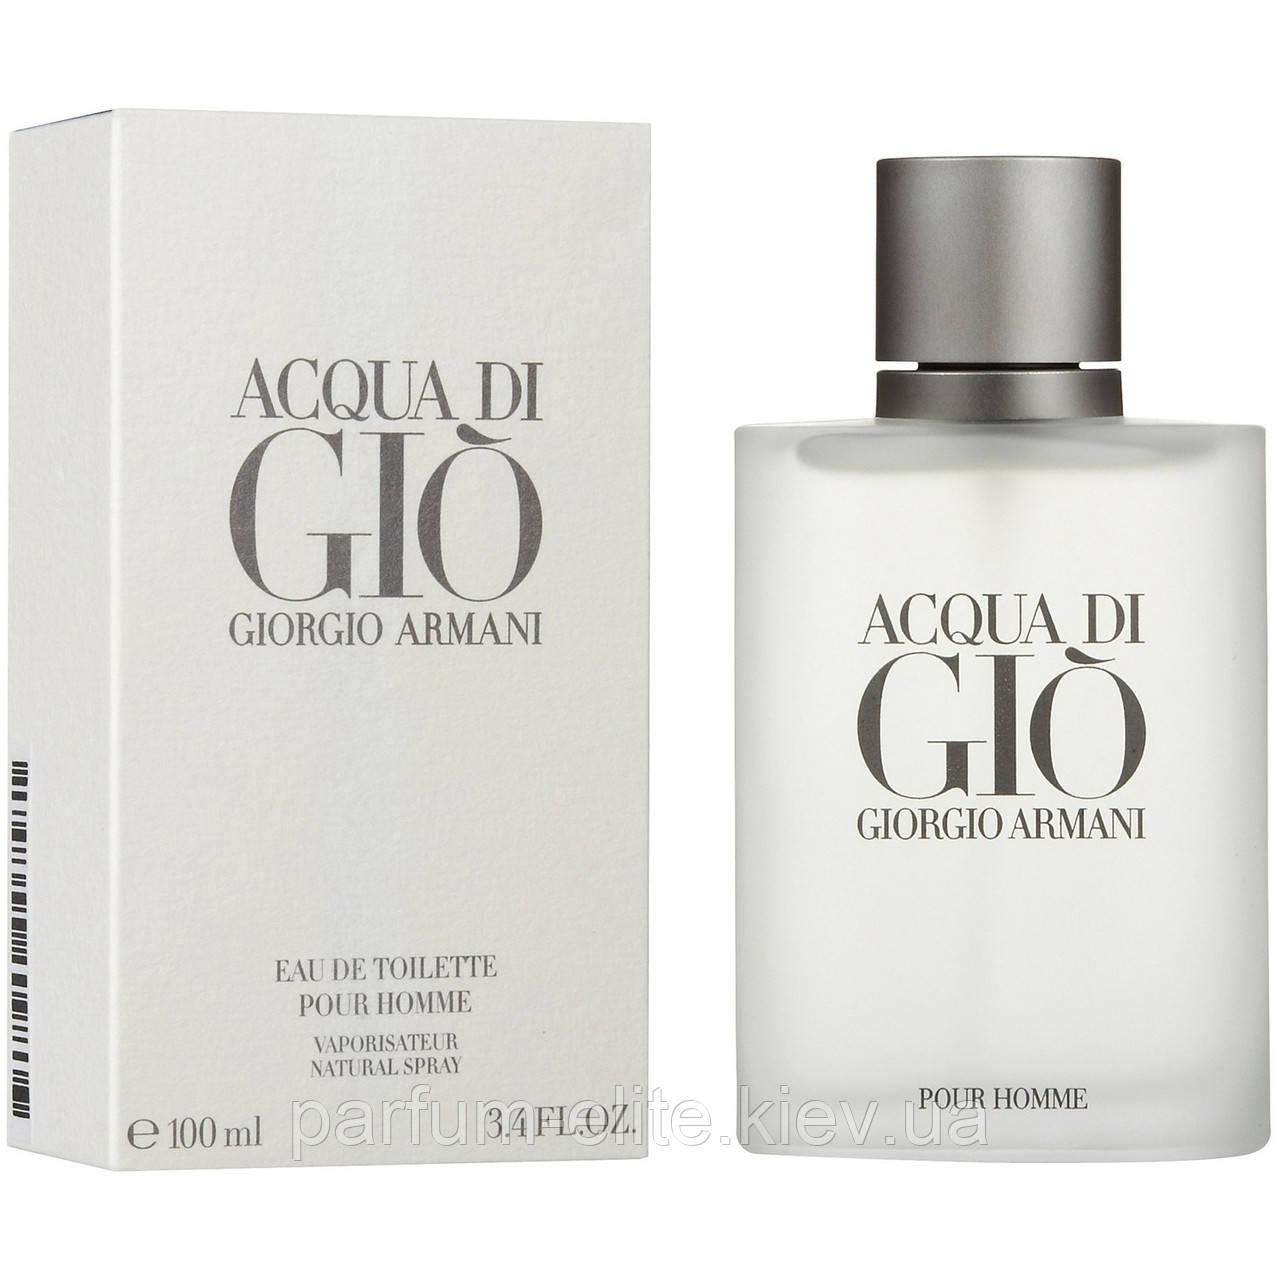 Мужская туалетная вода Giorgio Armani Acqua Di Gio 50ml - Интернет-Магазин